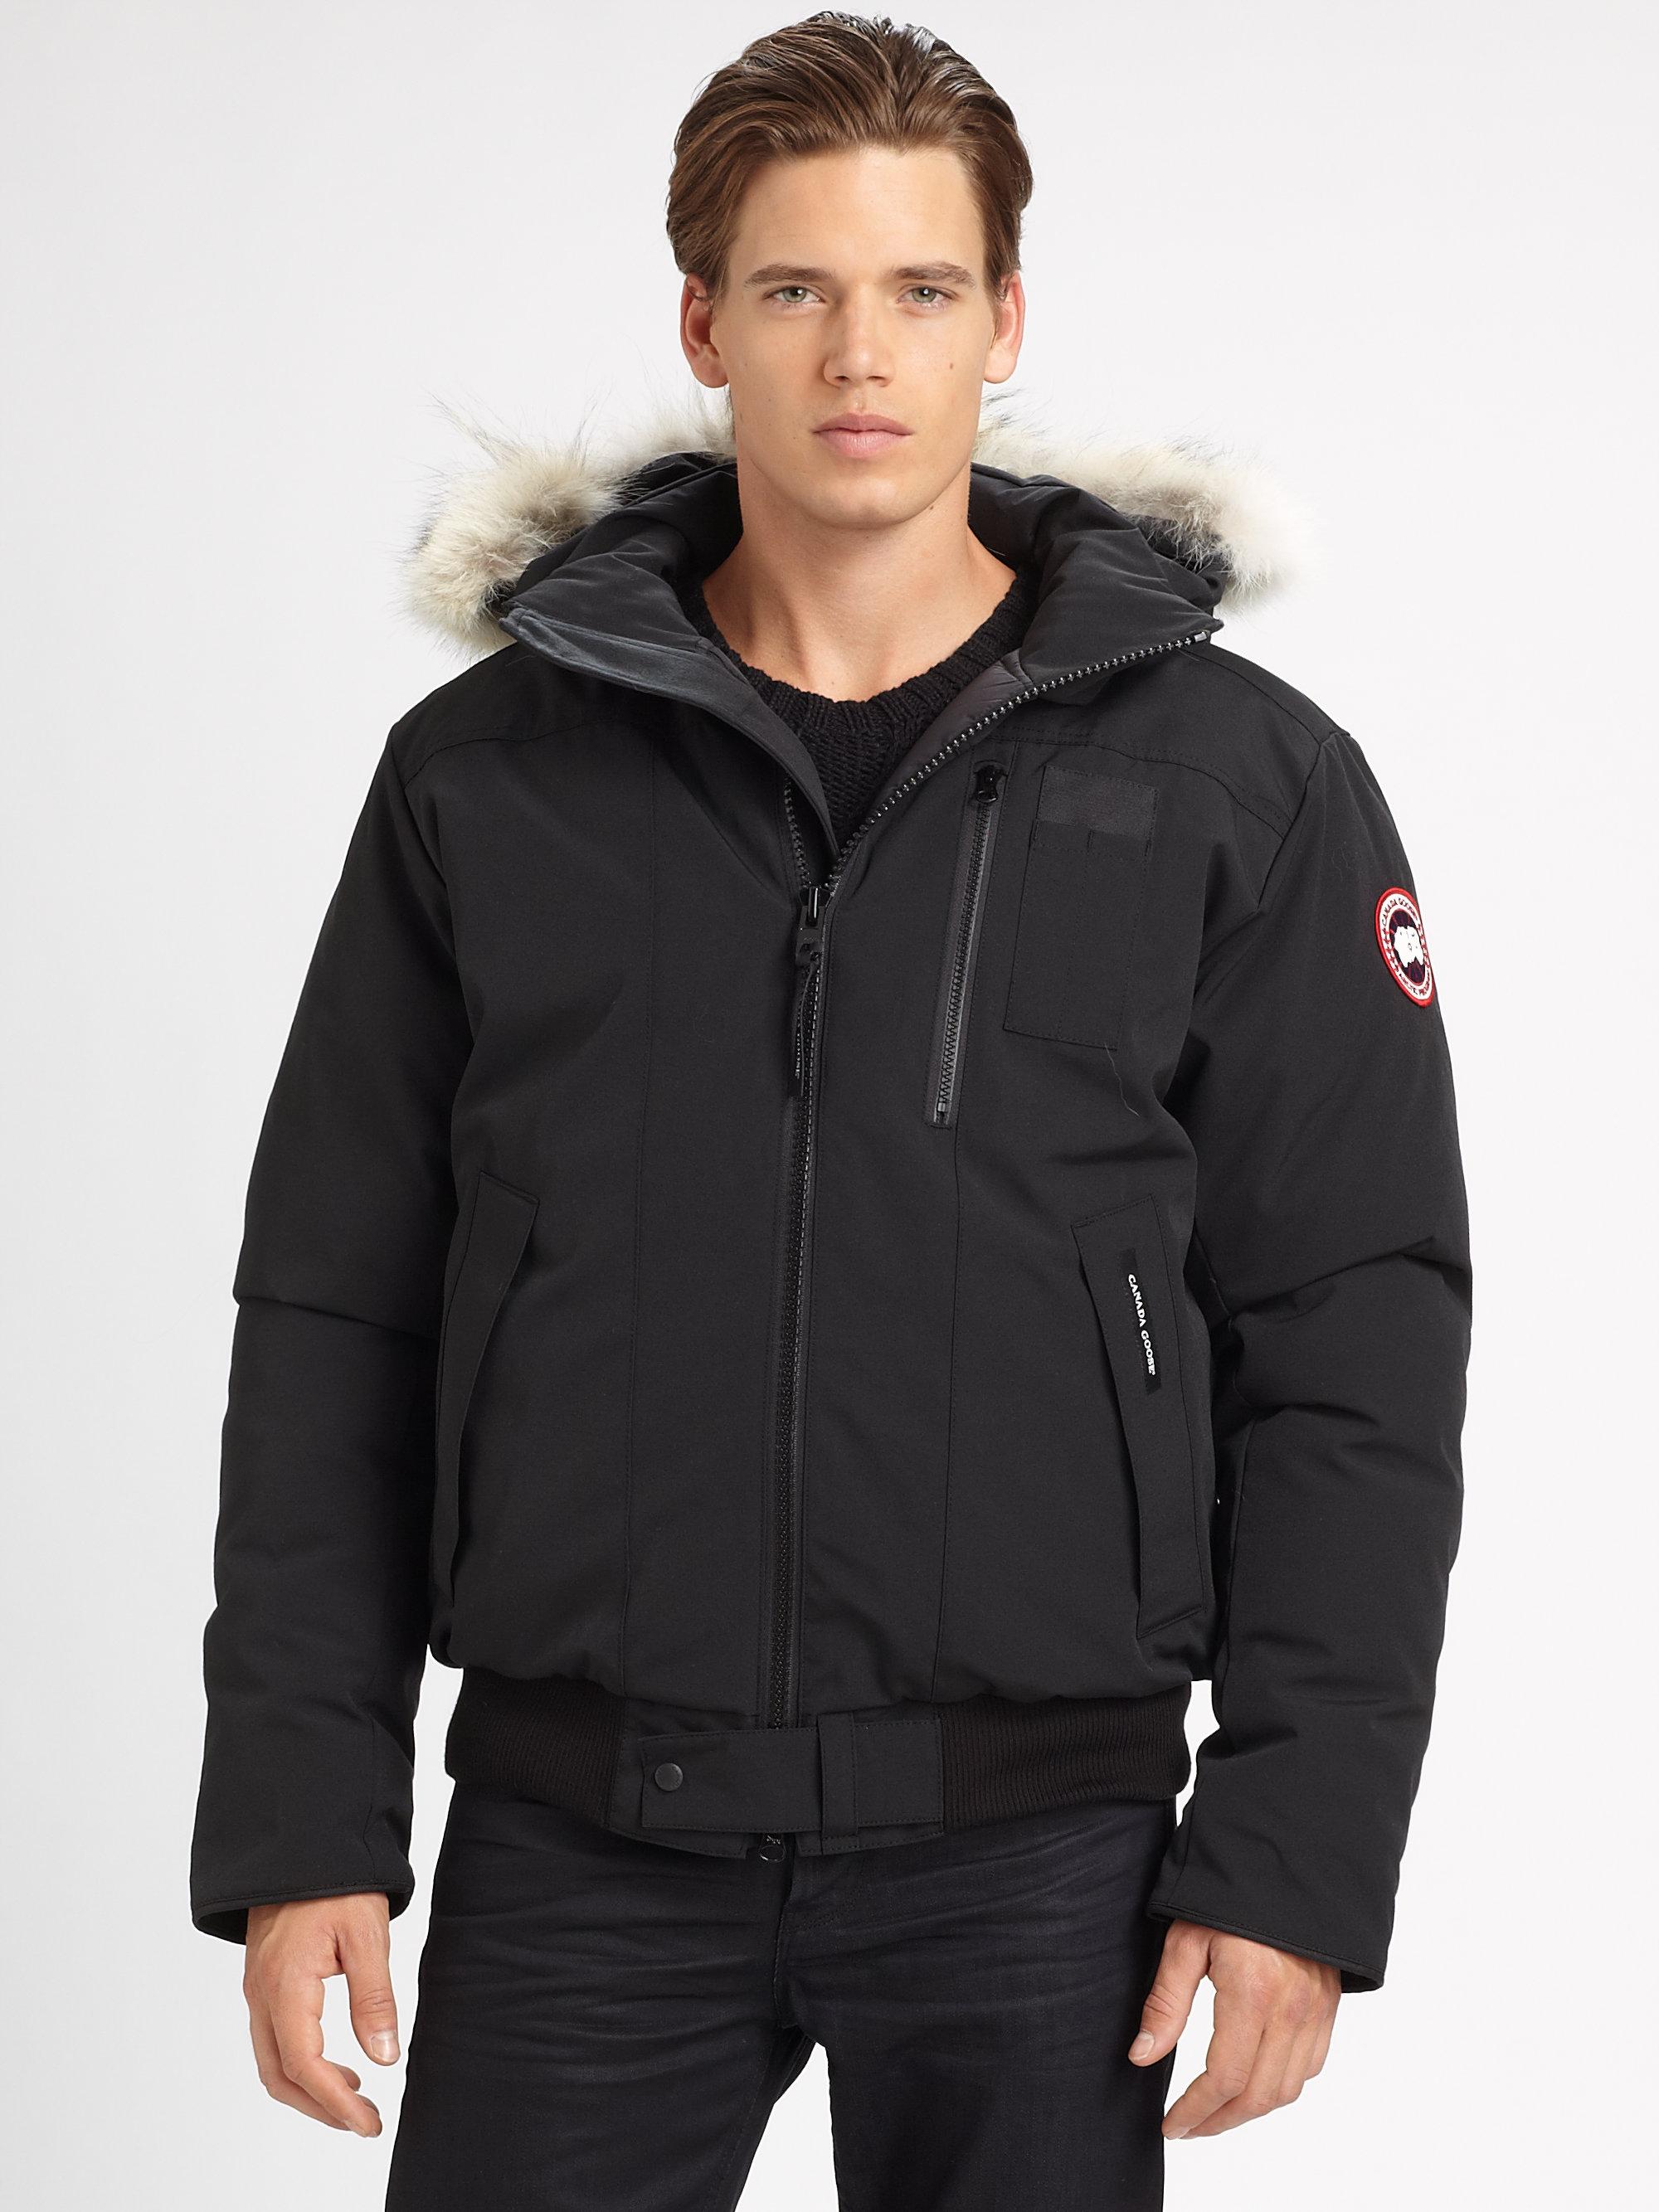 Canada Goose Borden Bomber Jacket In Black For Men Lyst